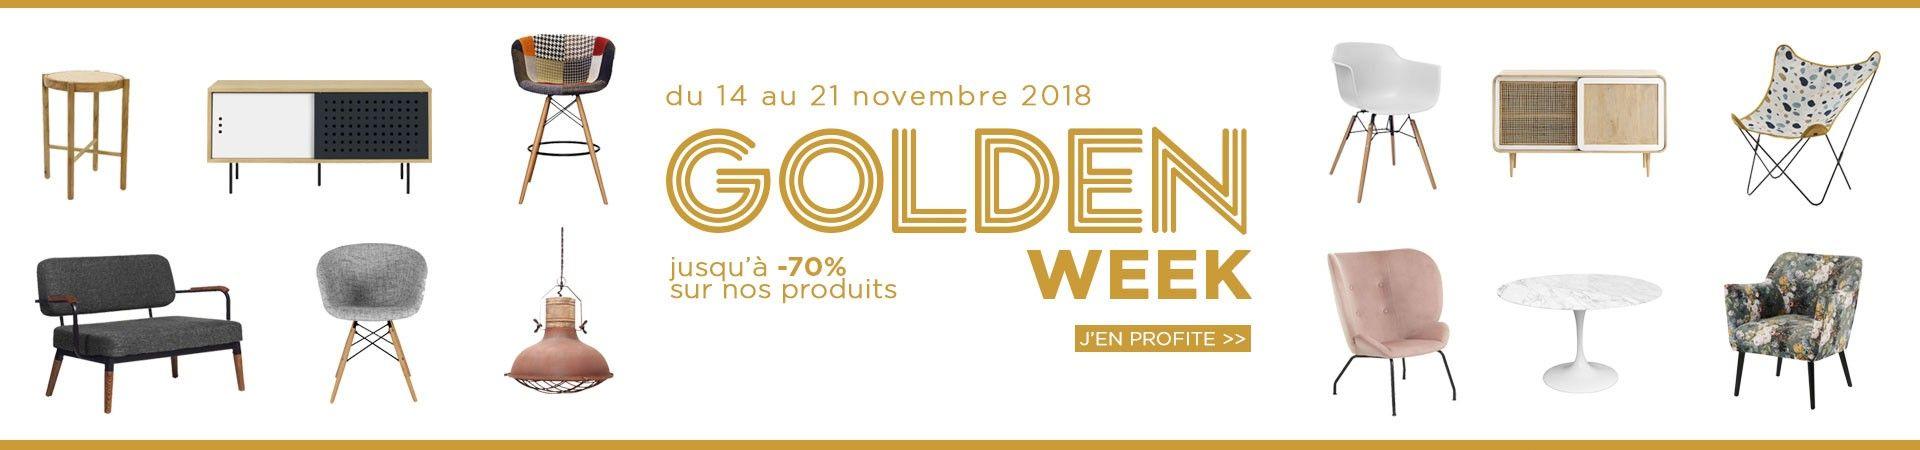 golden week promotions